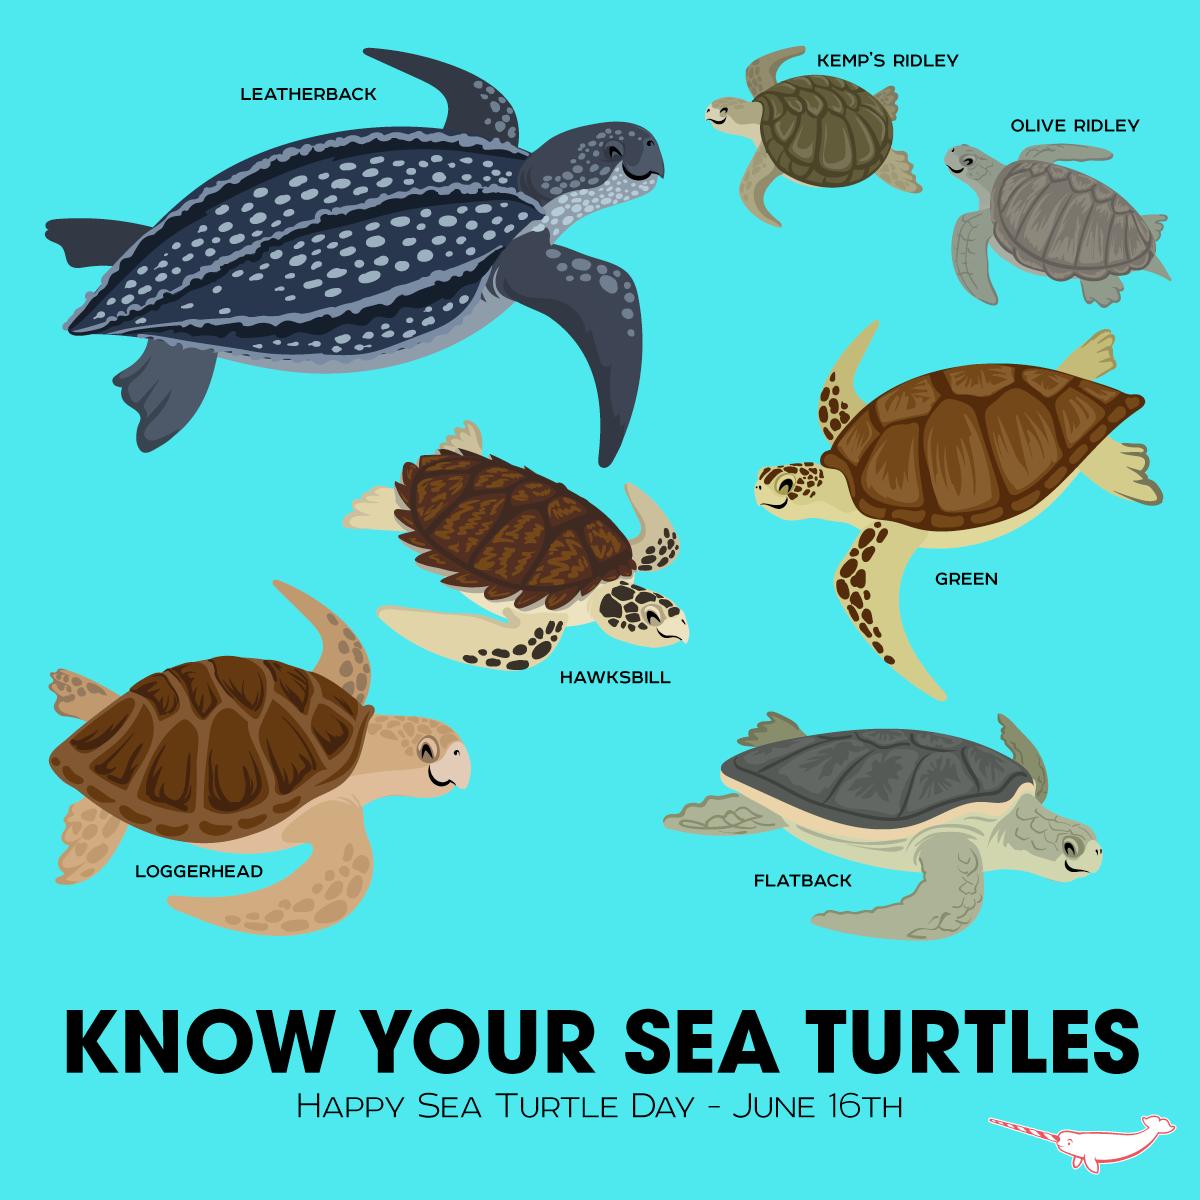 Sea Turtle Anatomy Diagram For 2nd Graders - DIY Wiring Diagrams •